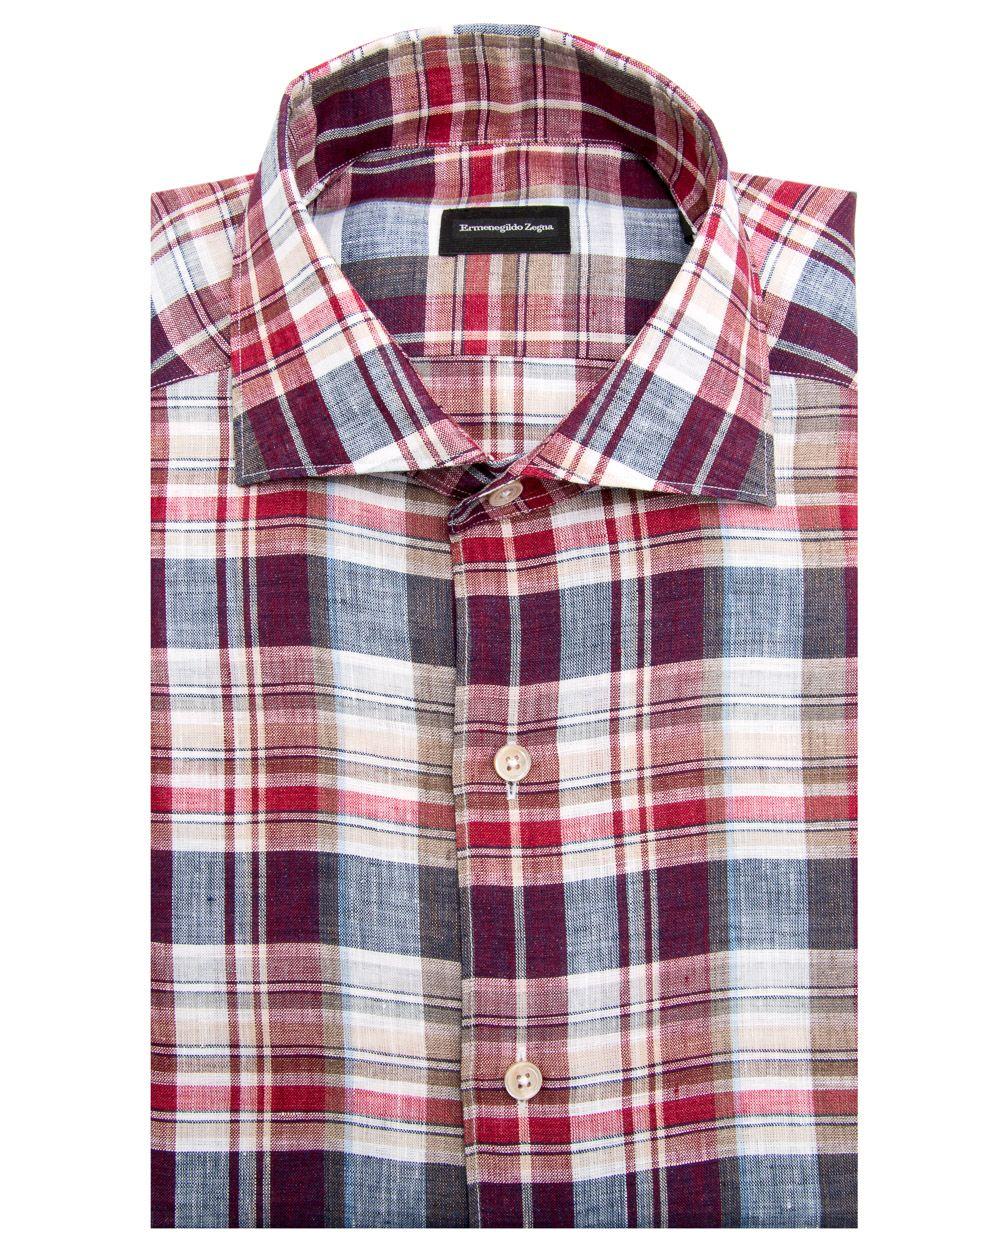 Ermenegildo Zegna Wine And Tan Bold Plaid Dress Shirt 680 Shirts